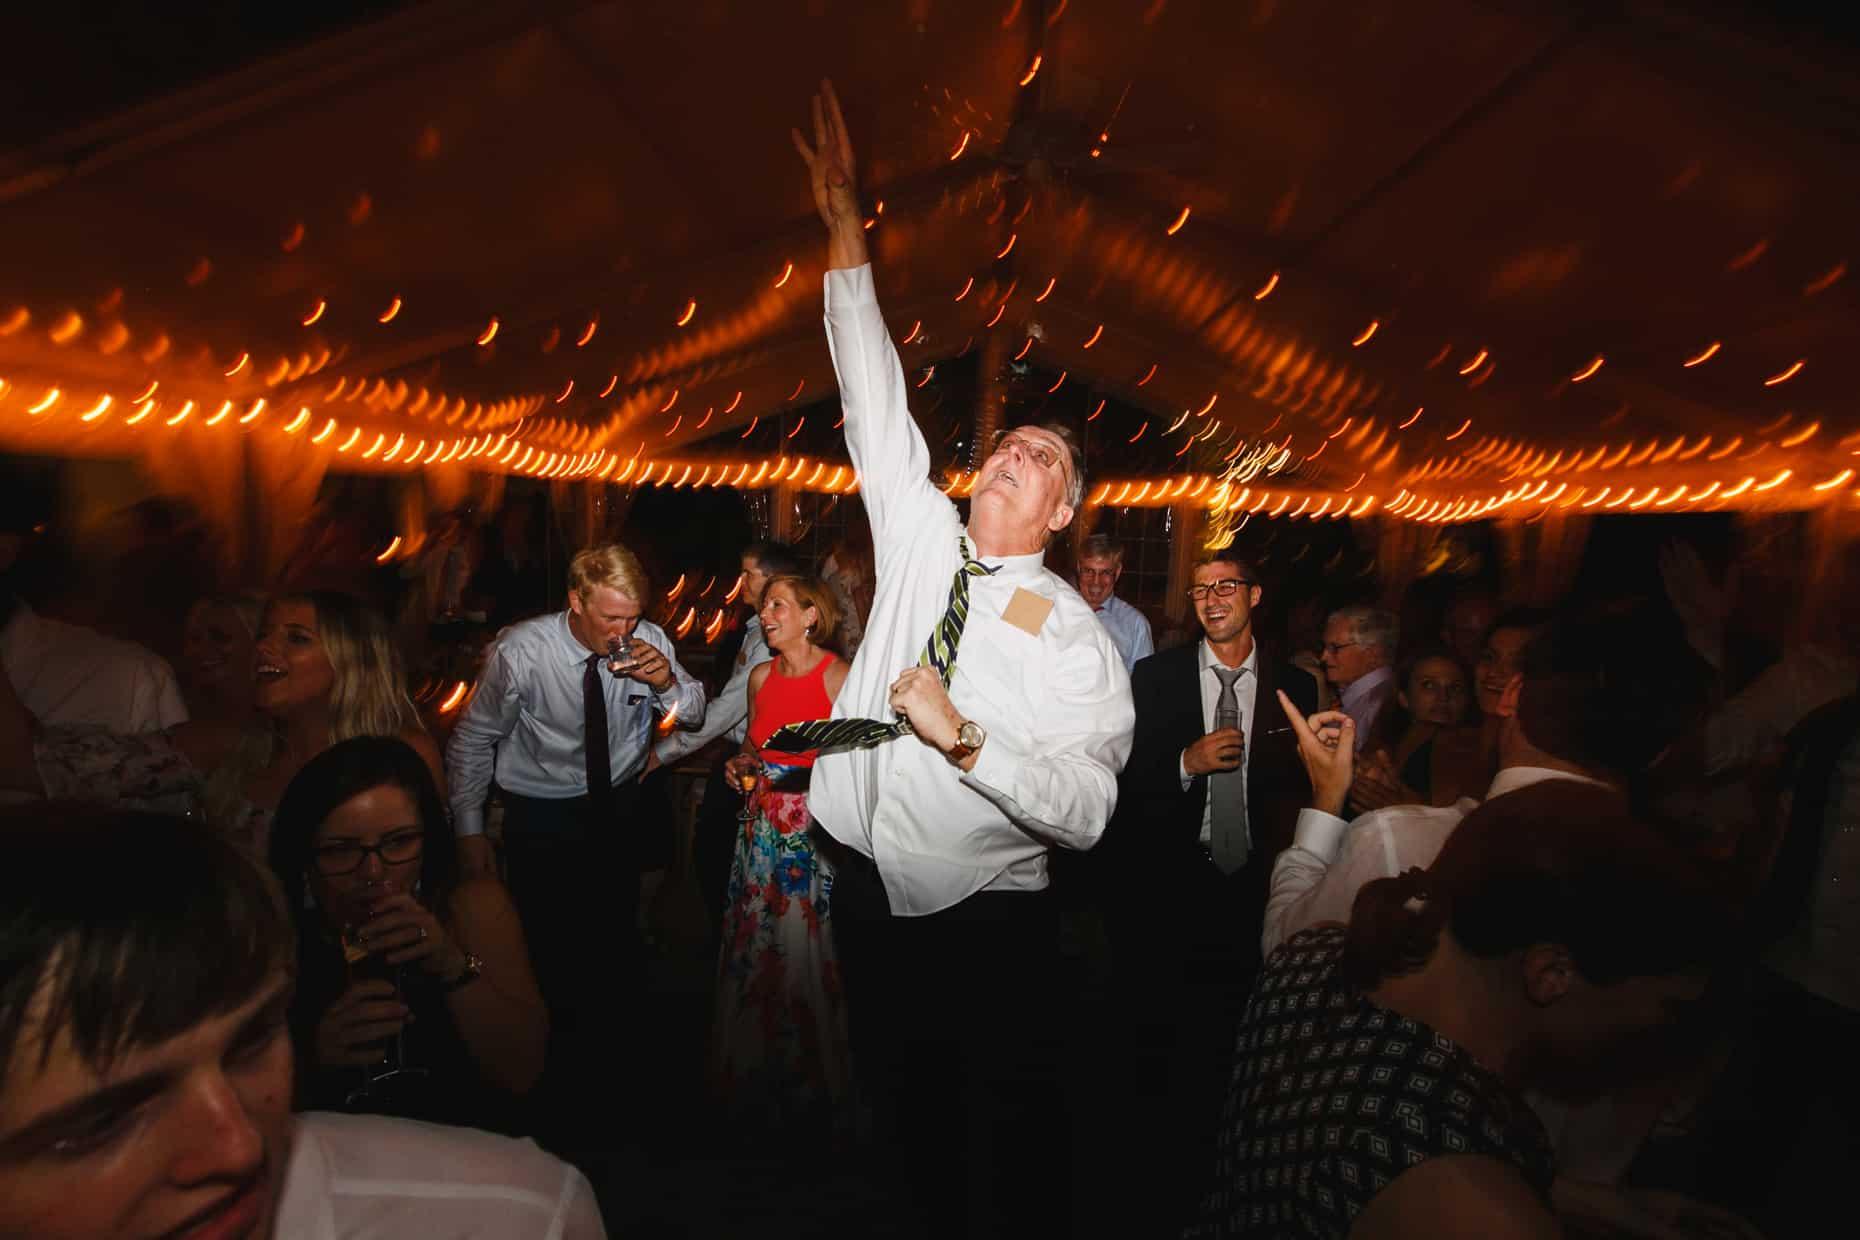 Philly Wedding Reception